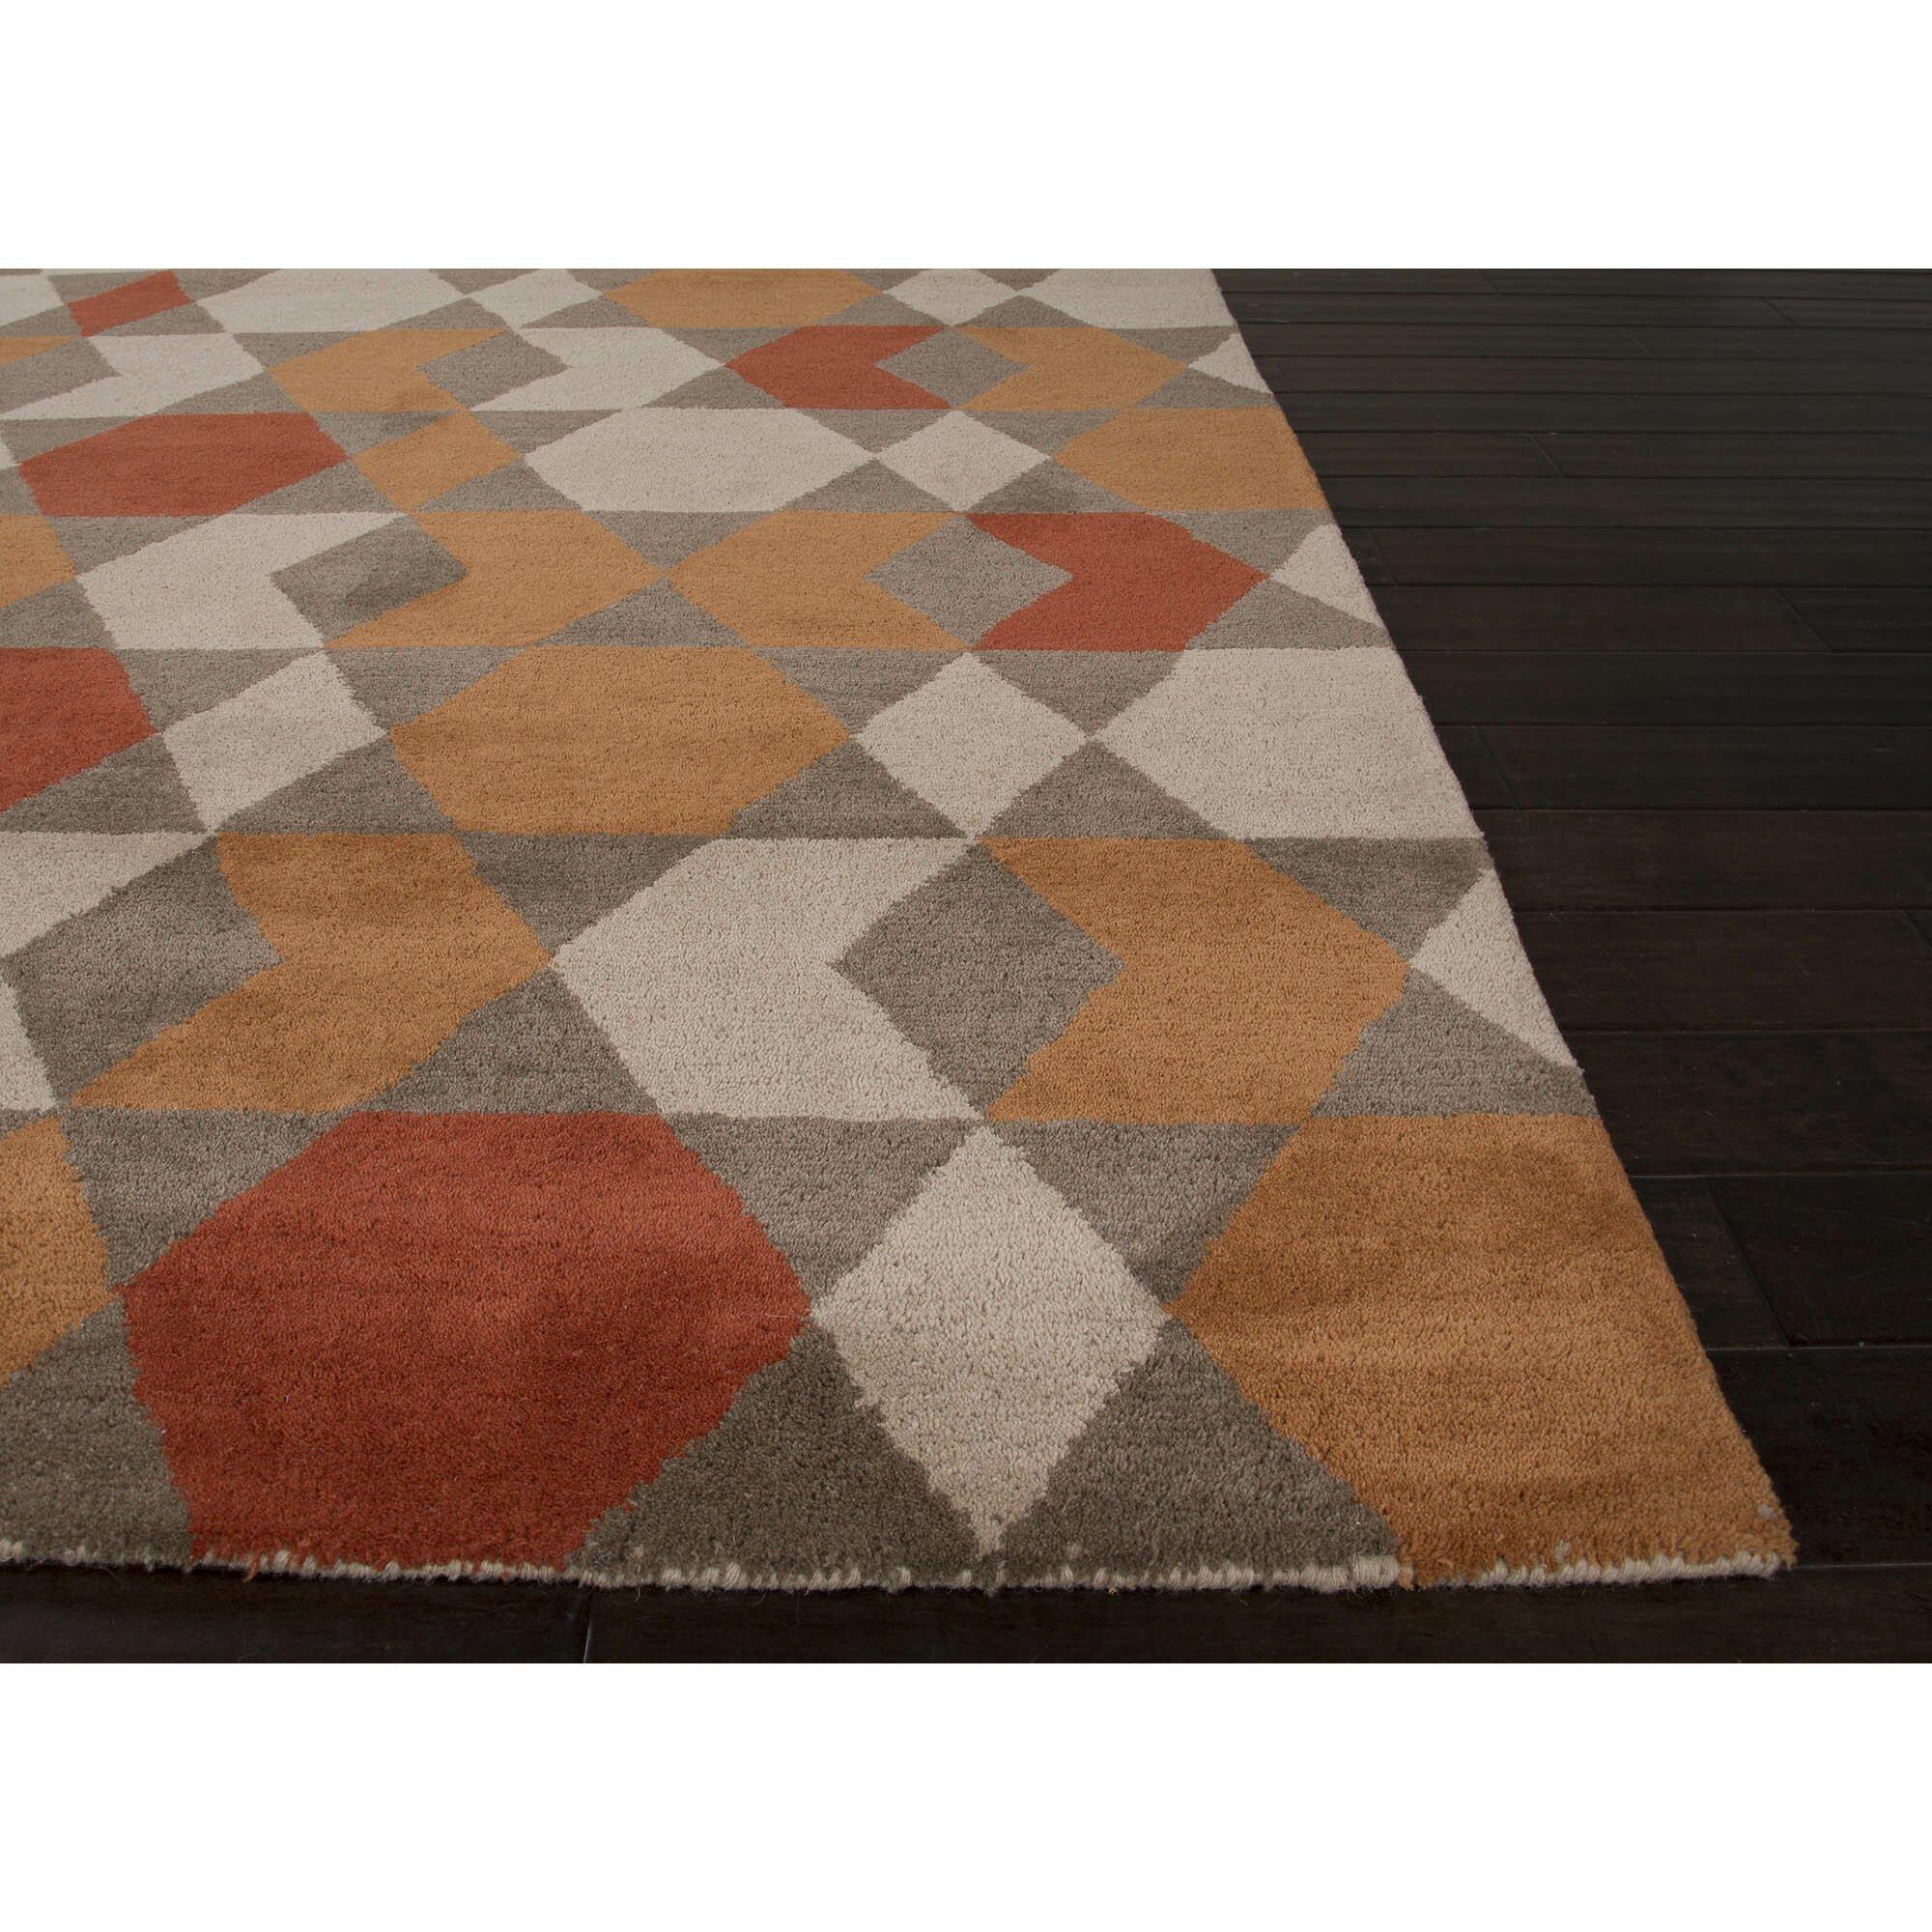 JaipurLiving Aztec Orange & Brown Area Rug